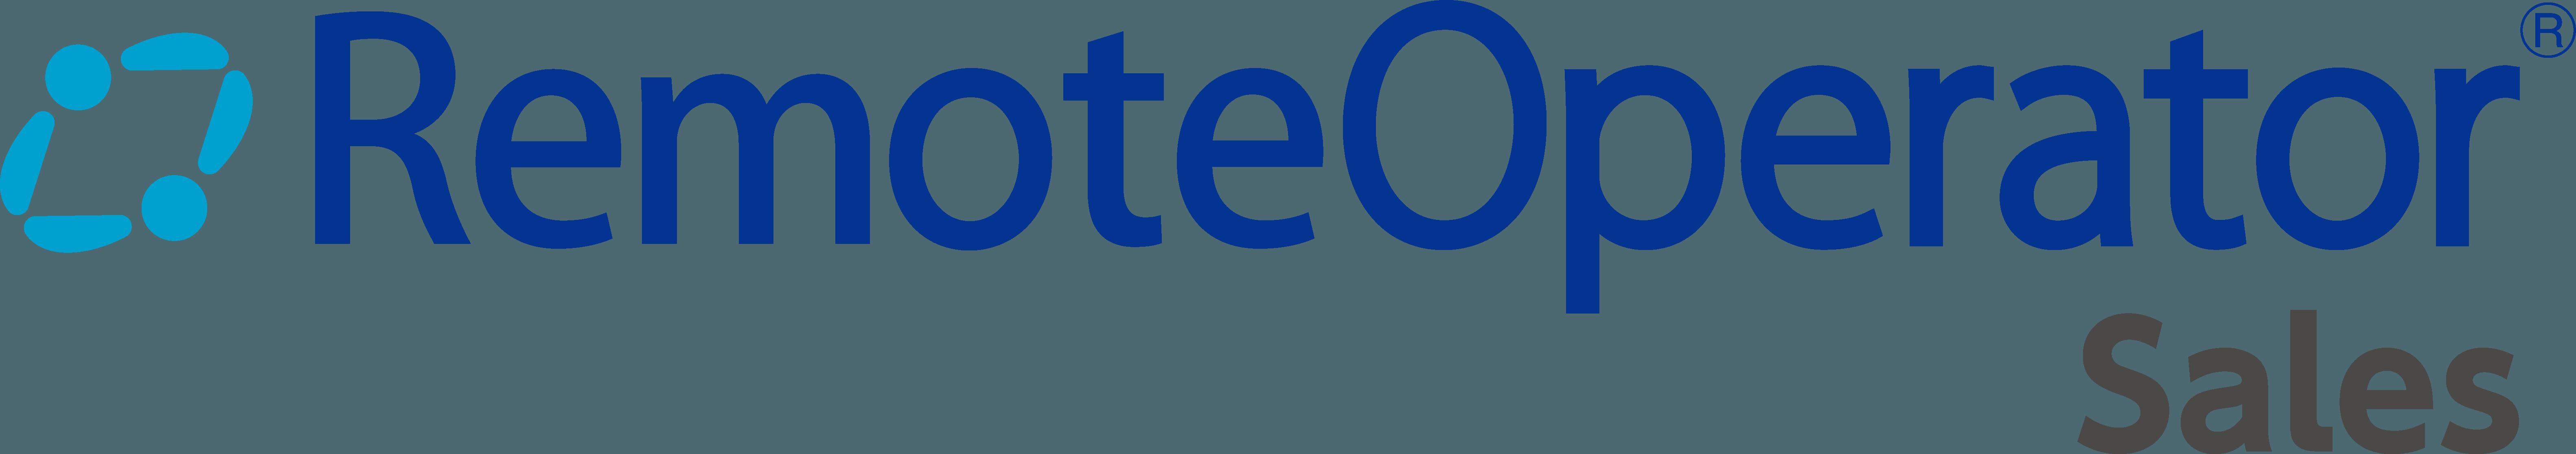 RemoteOperator Sales|インタビュー掲載